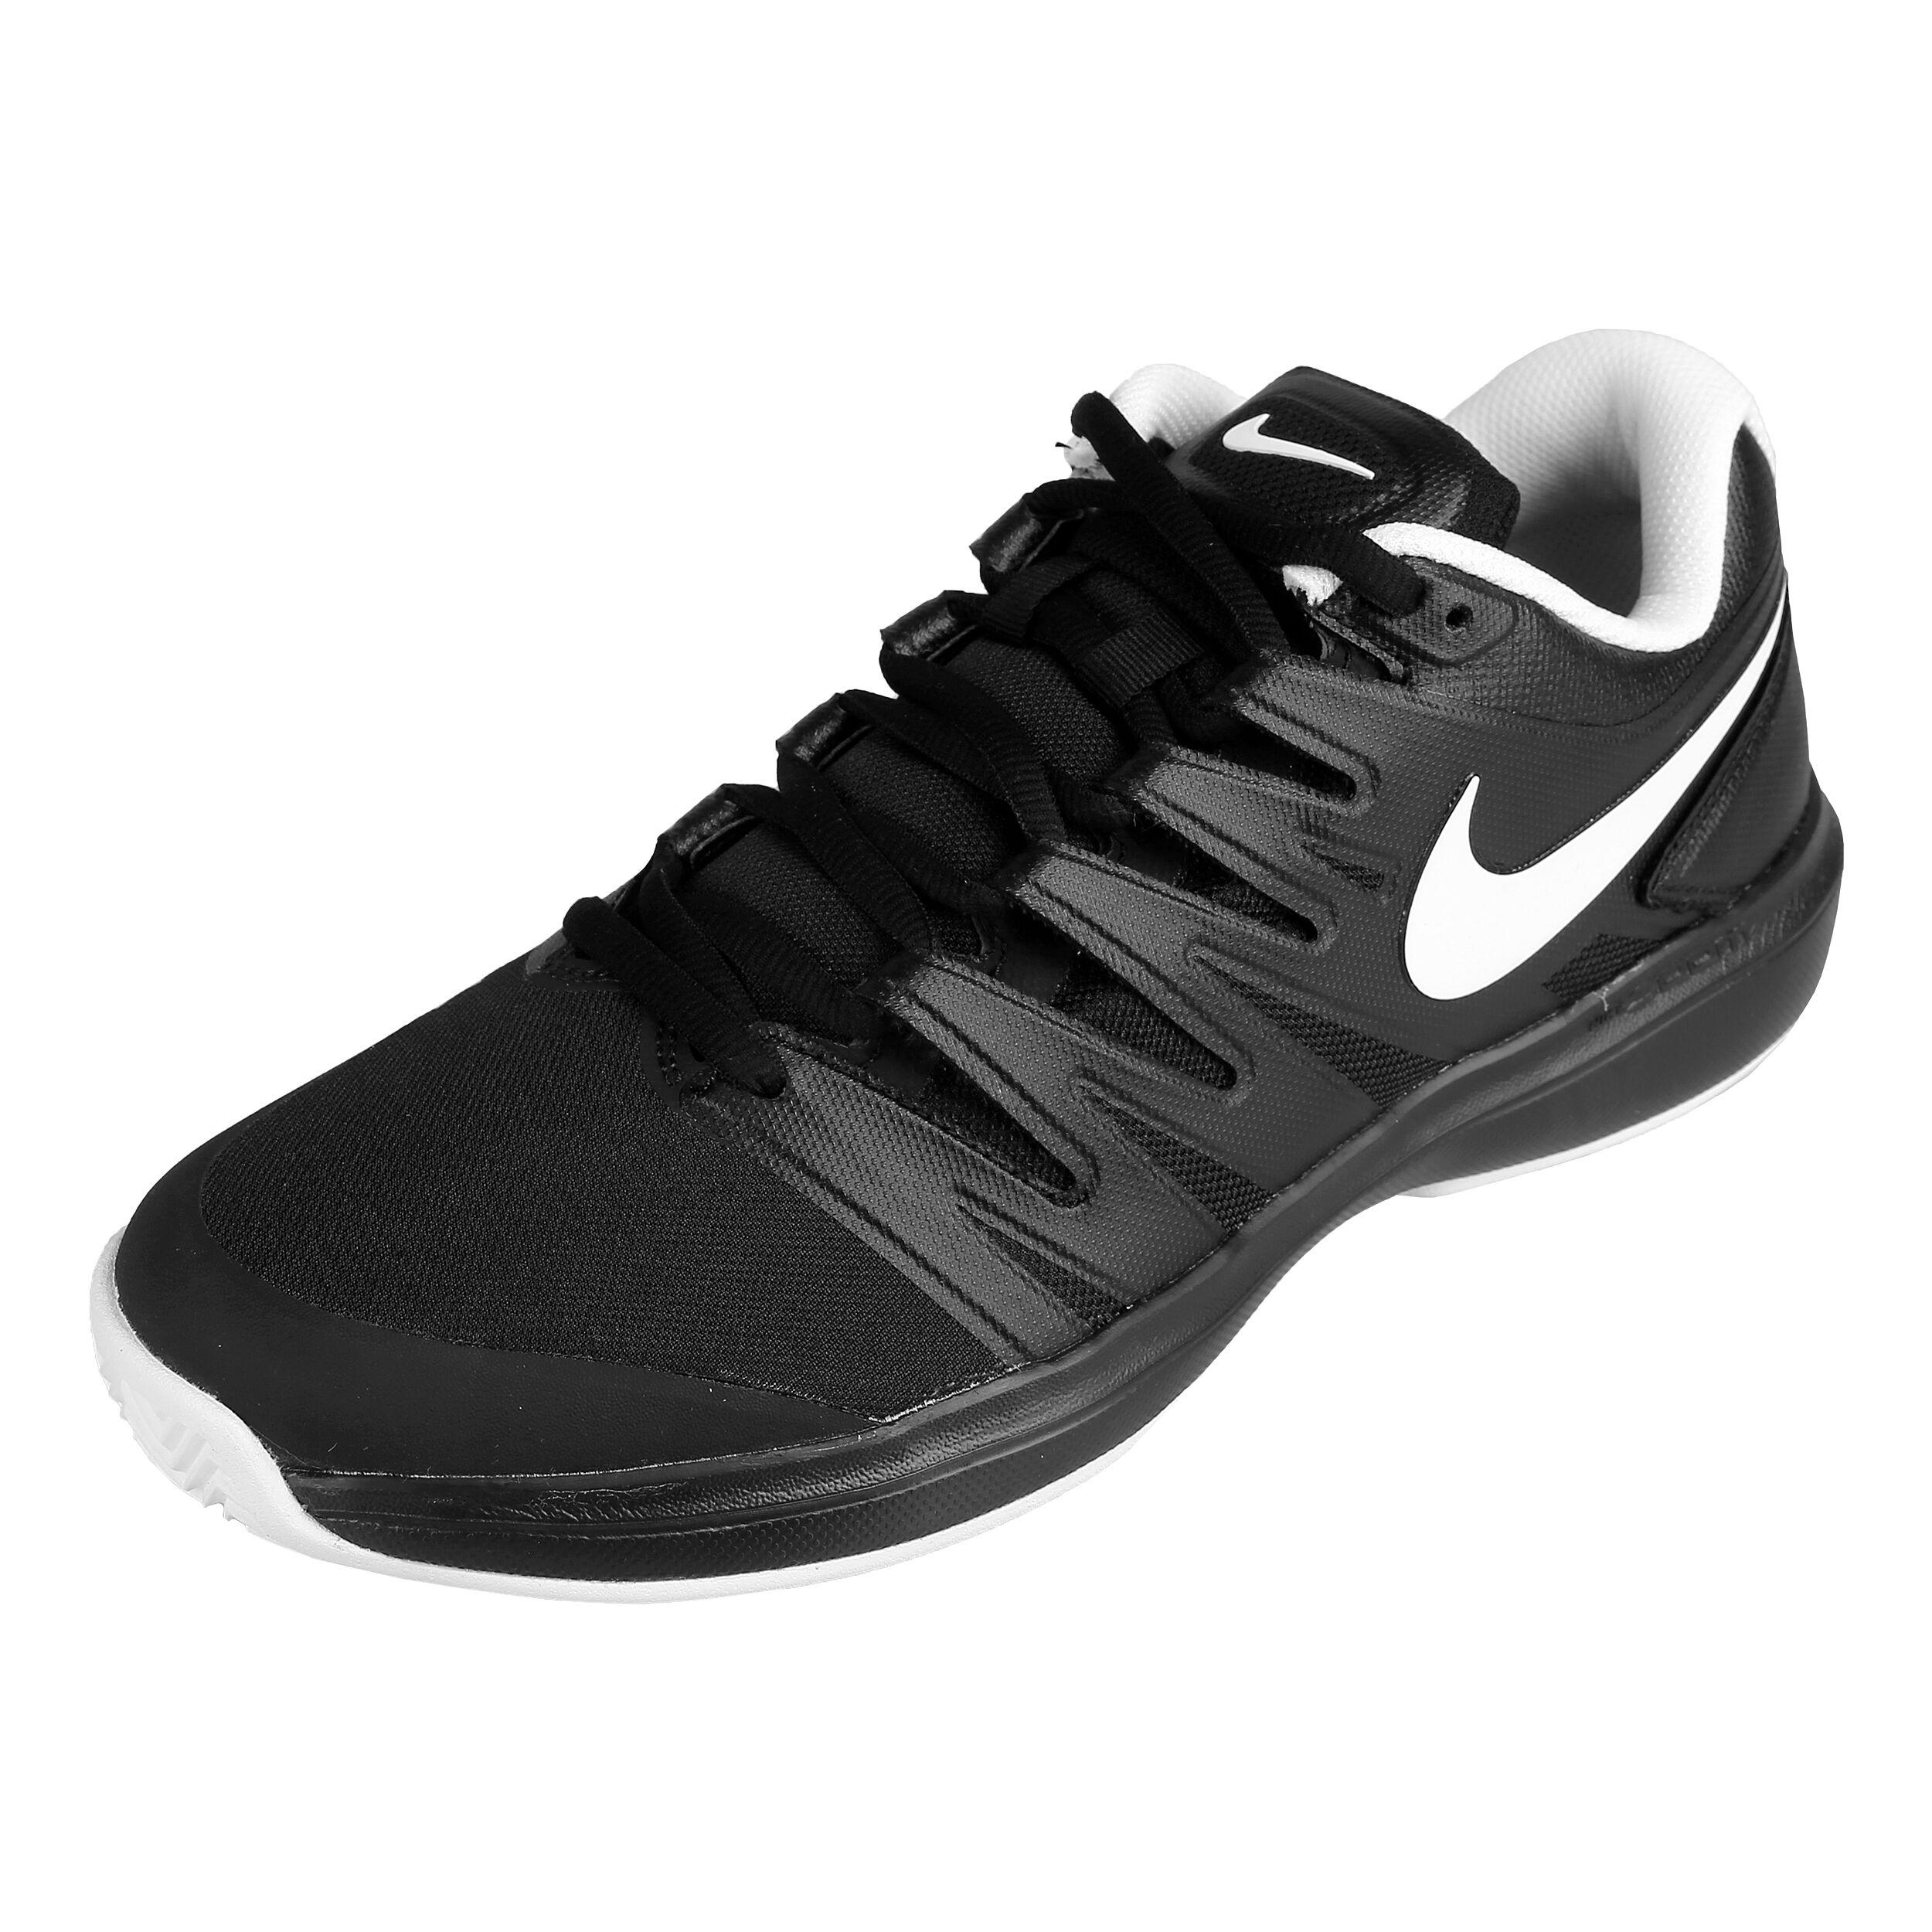 Nike Air Zoom Prestige Clay Scarpa Per Terra Rossa Uomini